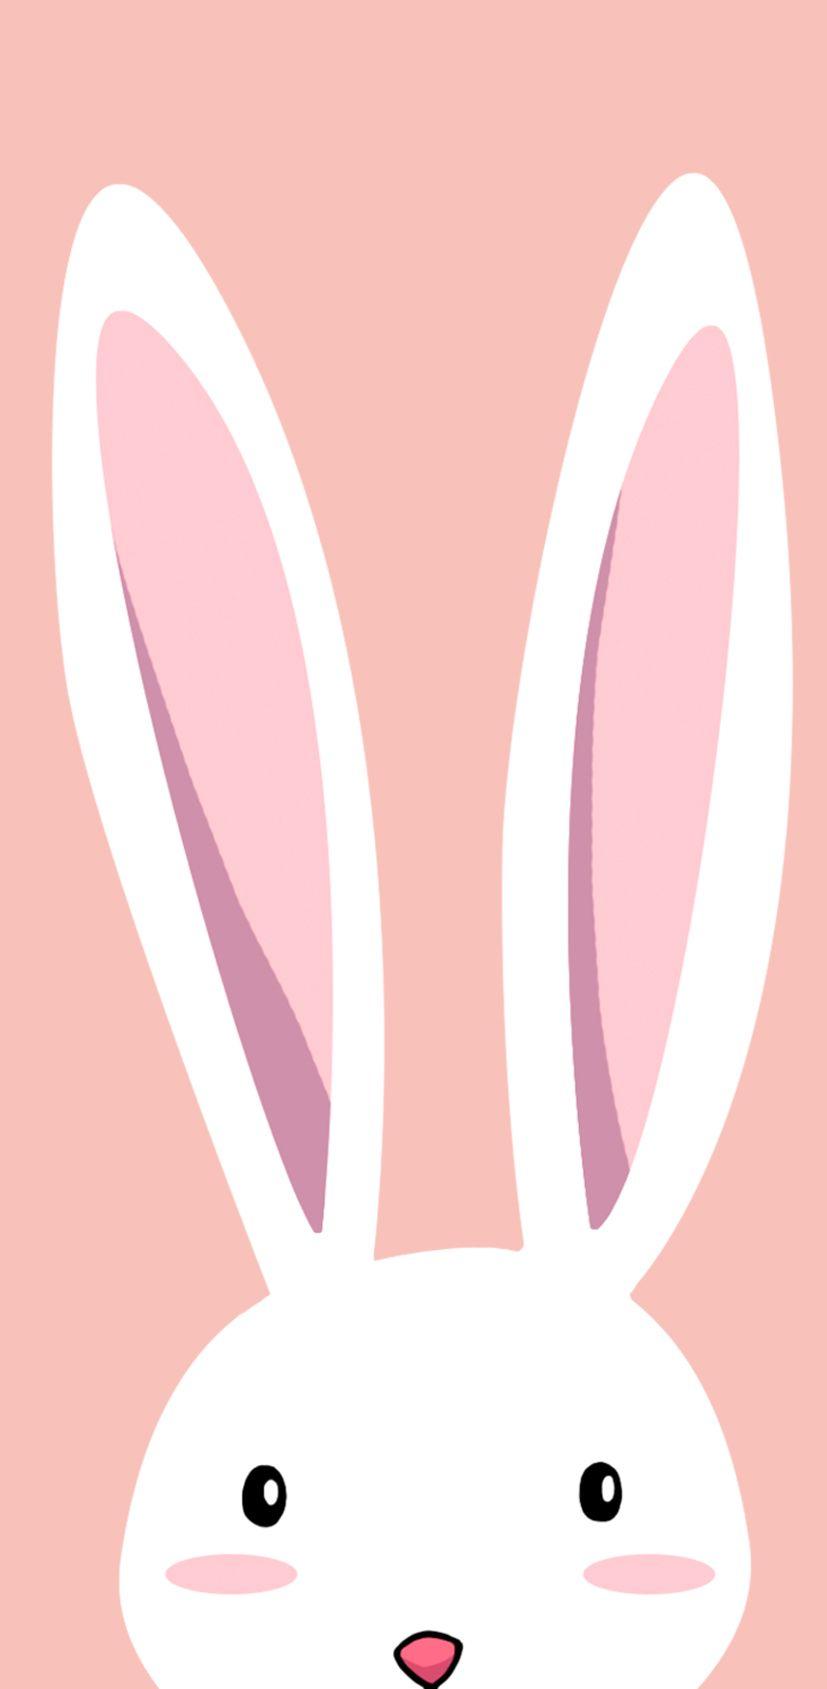 Gocase Easter Bunny Is Here Easter Wallpaper Happy Easter Wallpaper Bunny Wallpaper